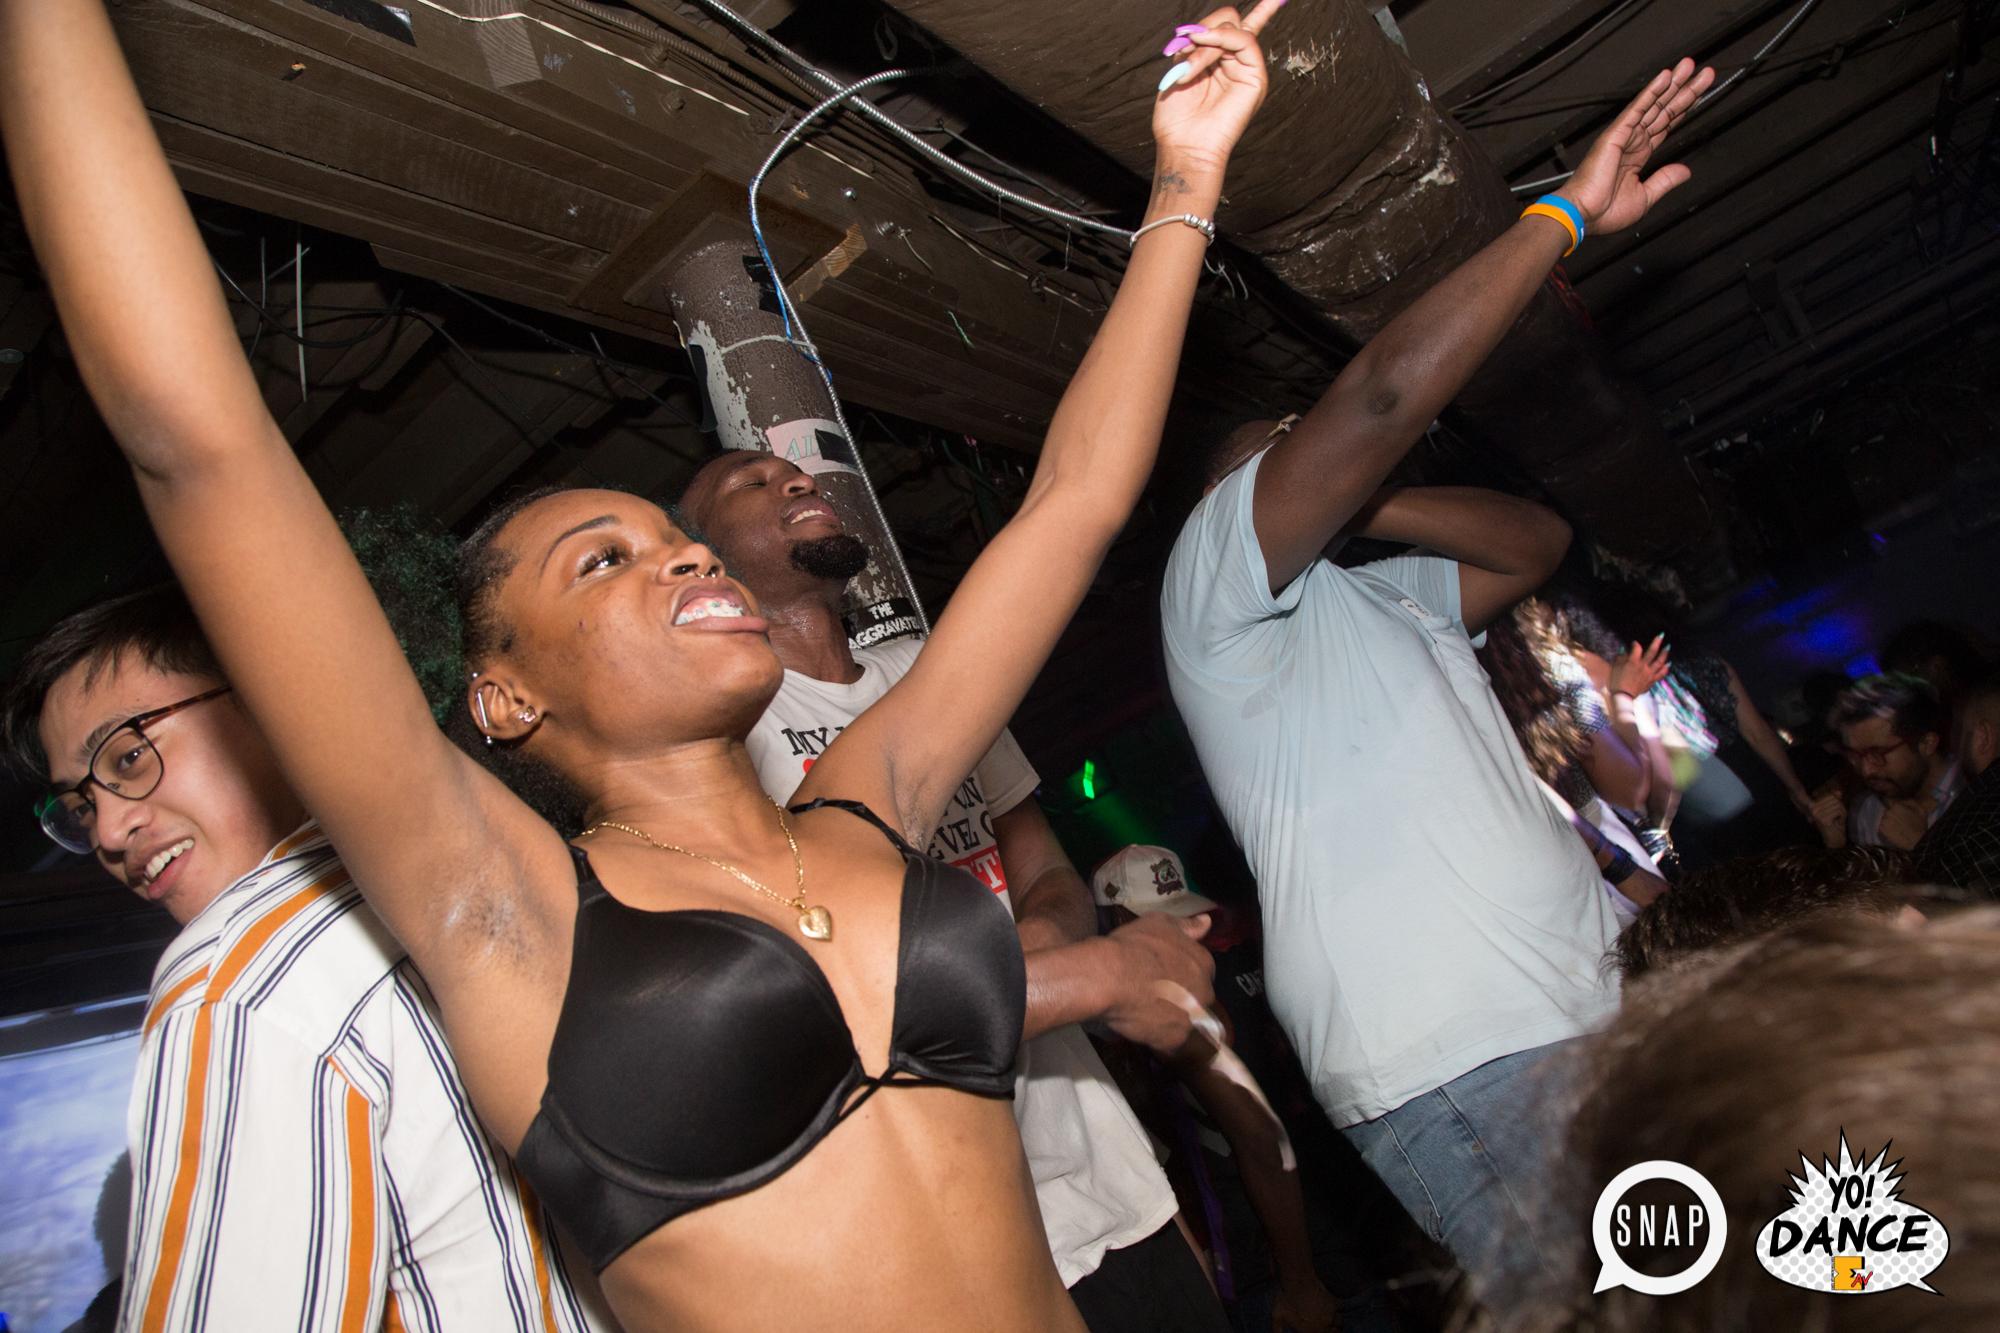 28Yo Dance Oh Snap Kid Atlanta.jpg